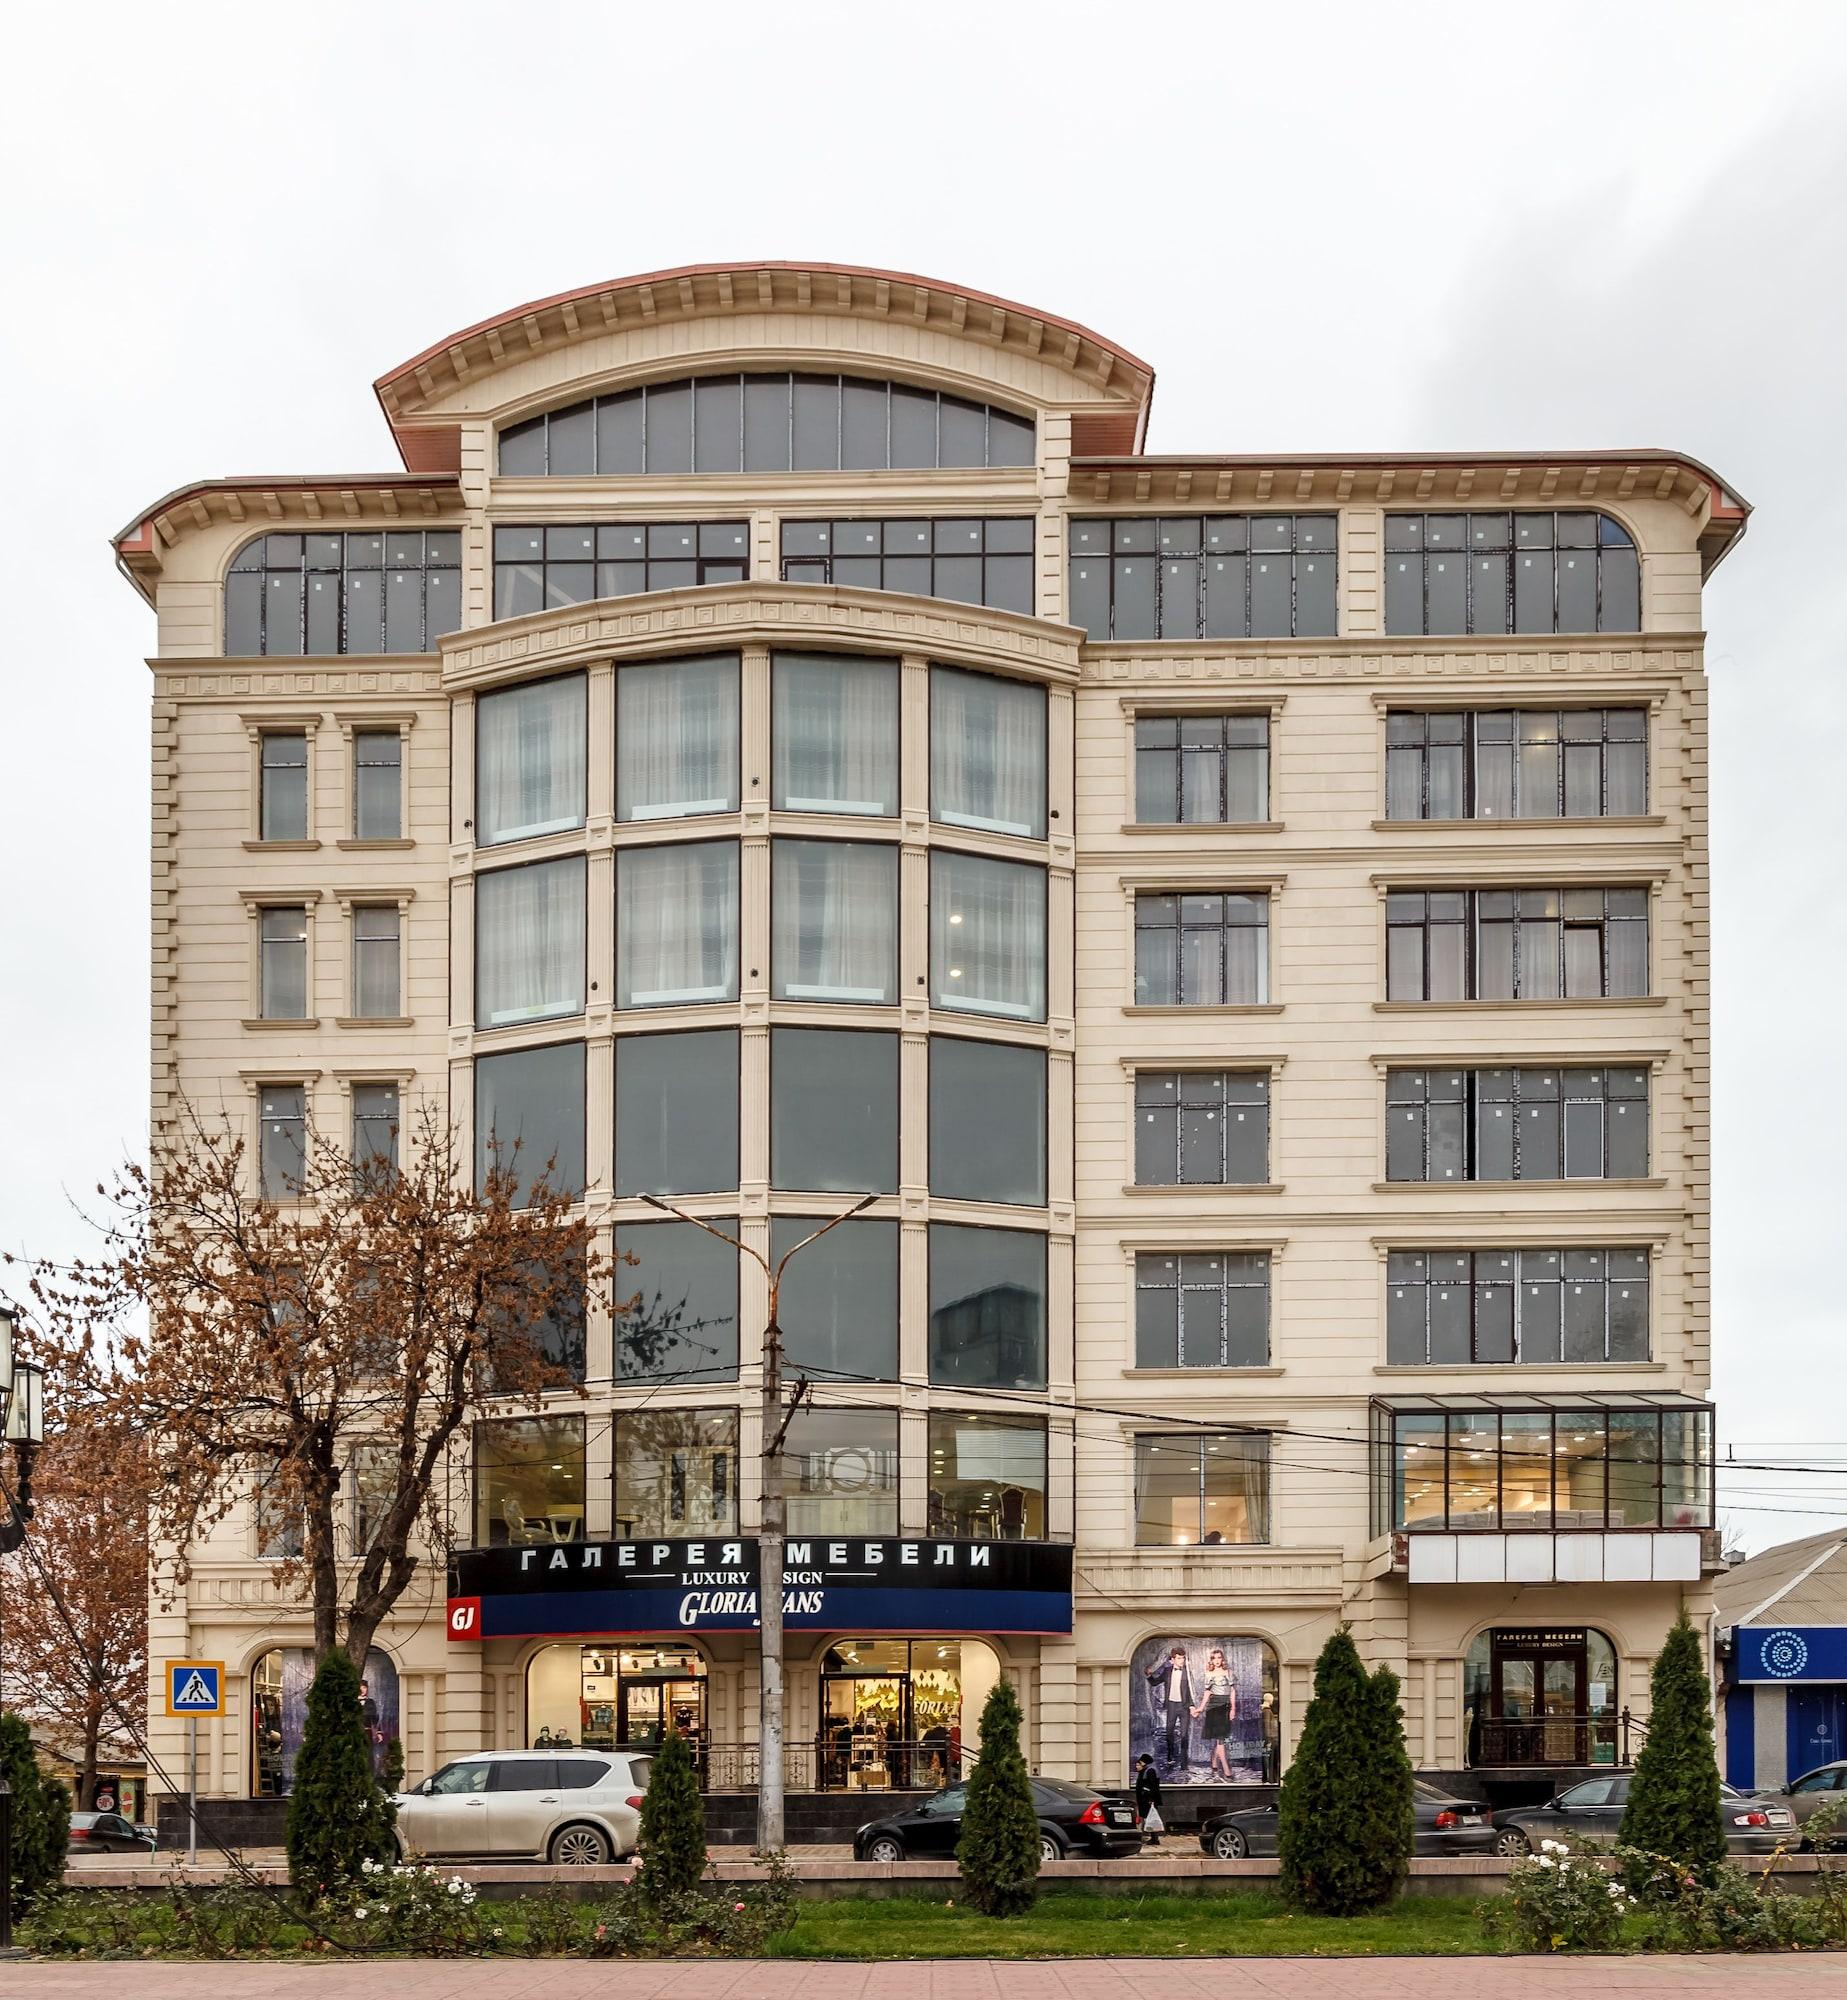 Central City Hotel Makhachkala, Makhachkala gorsovet